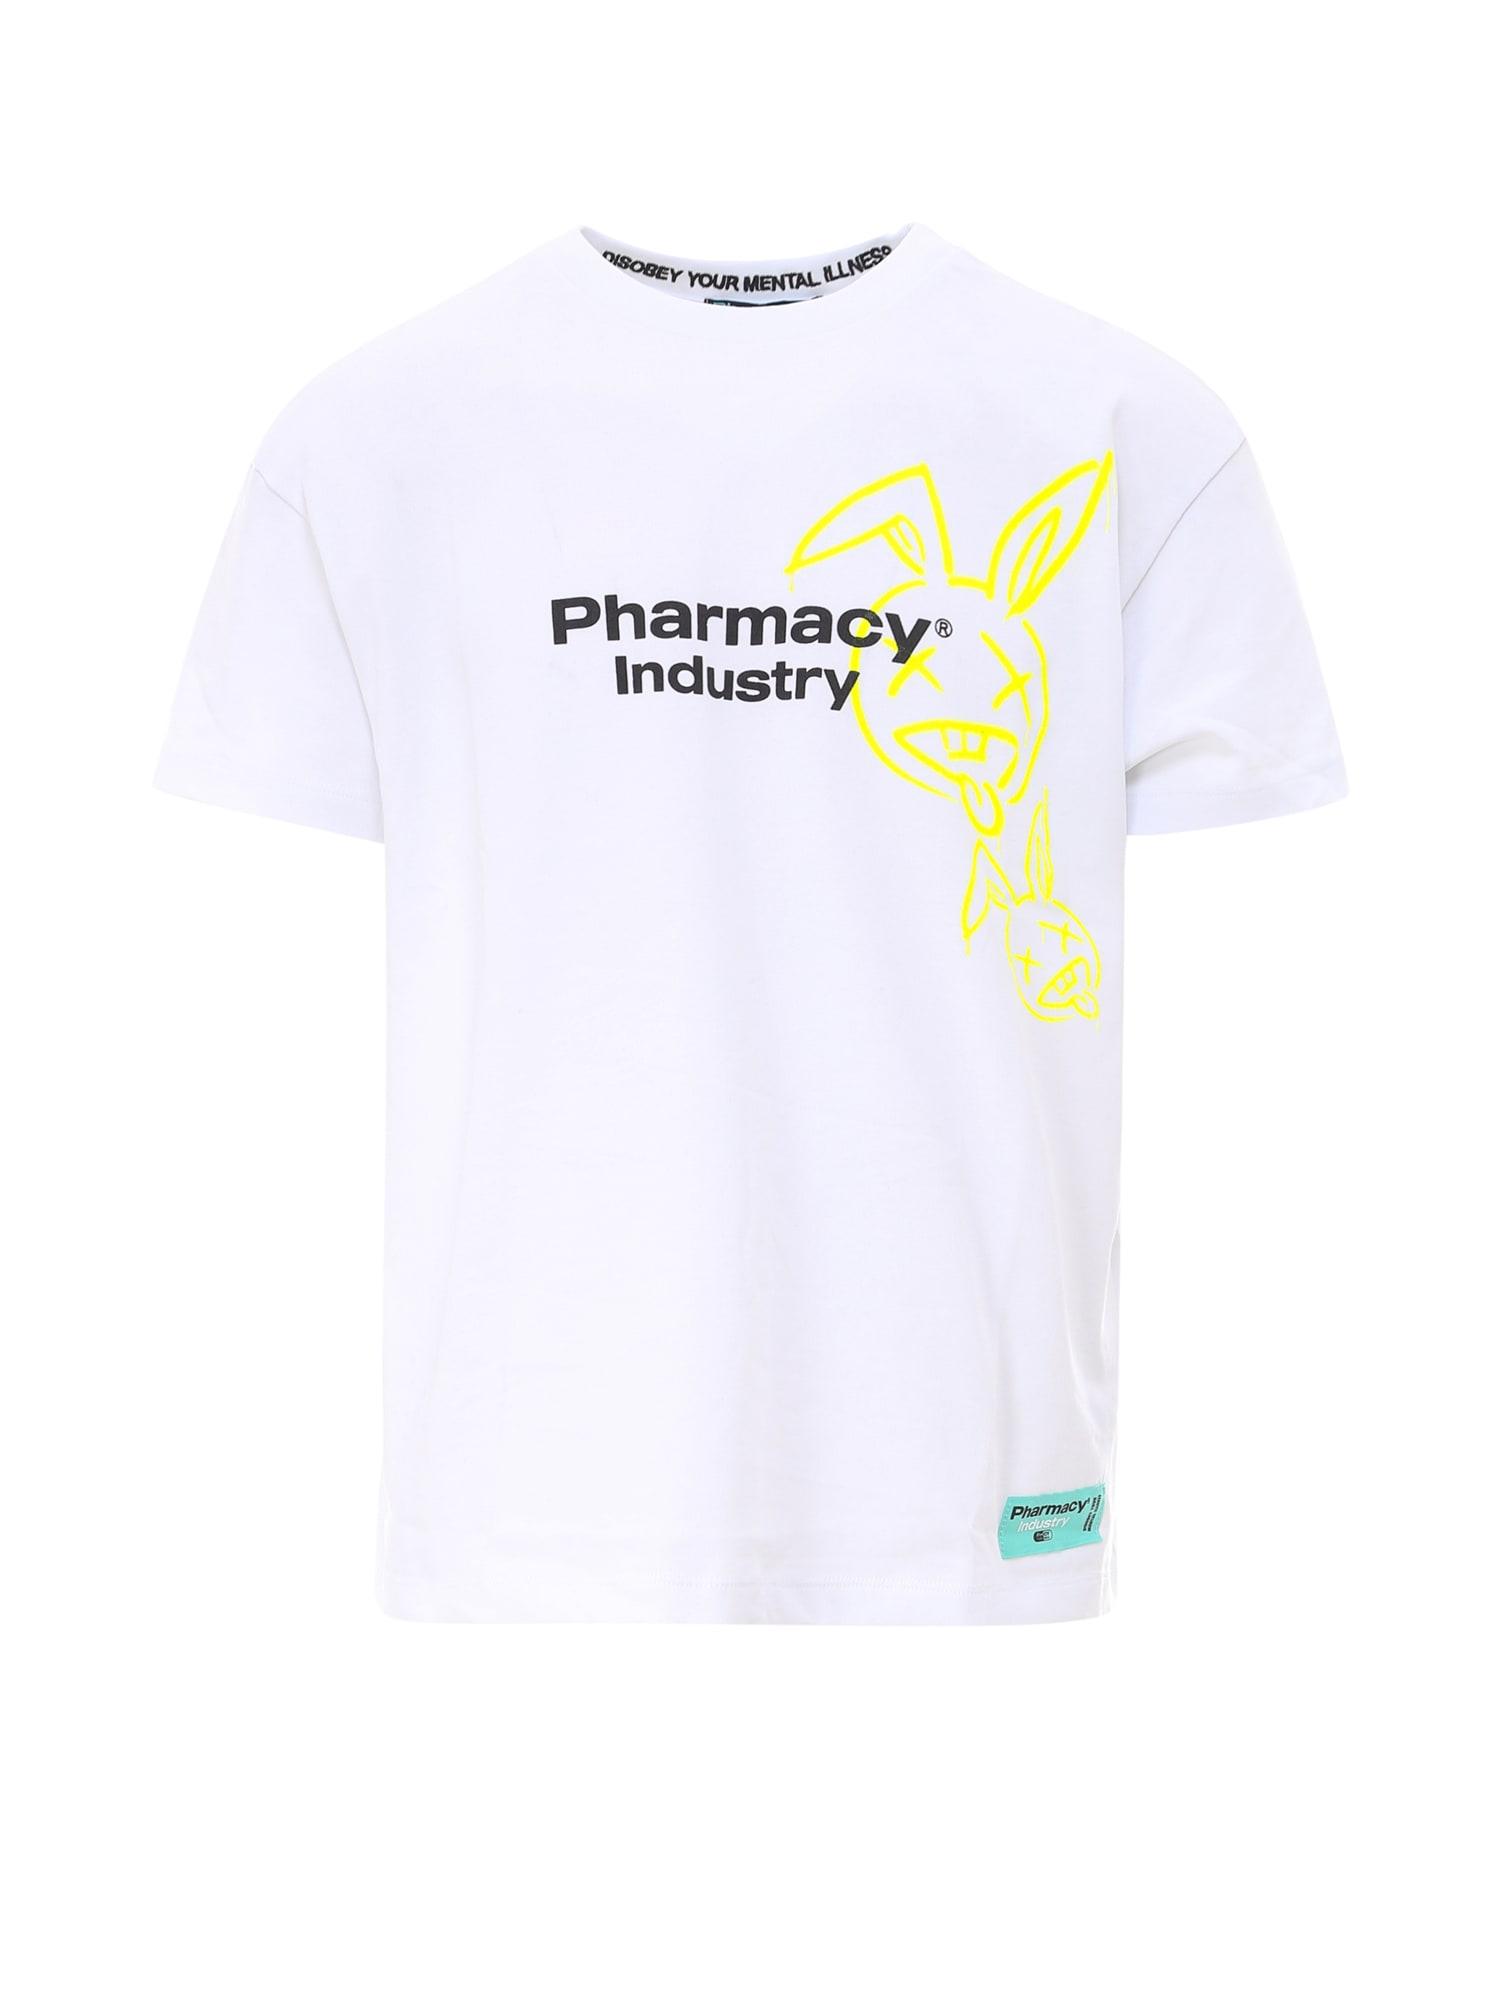 Pharmacy Industry T-shirt